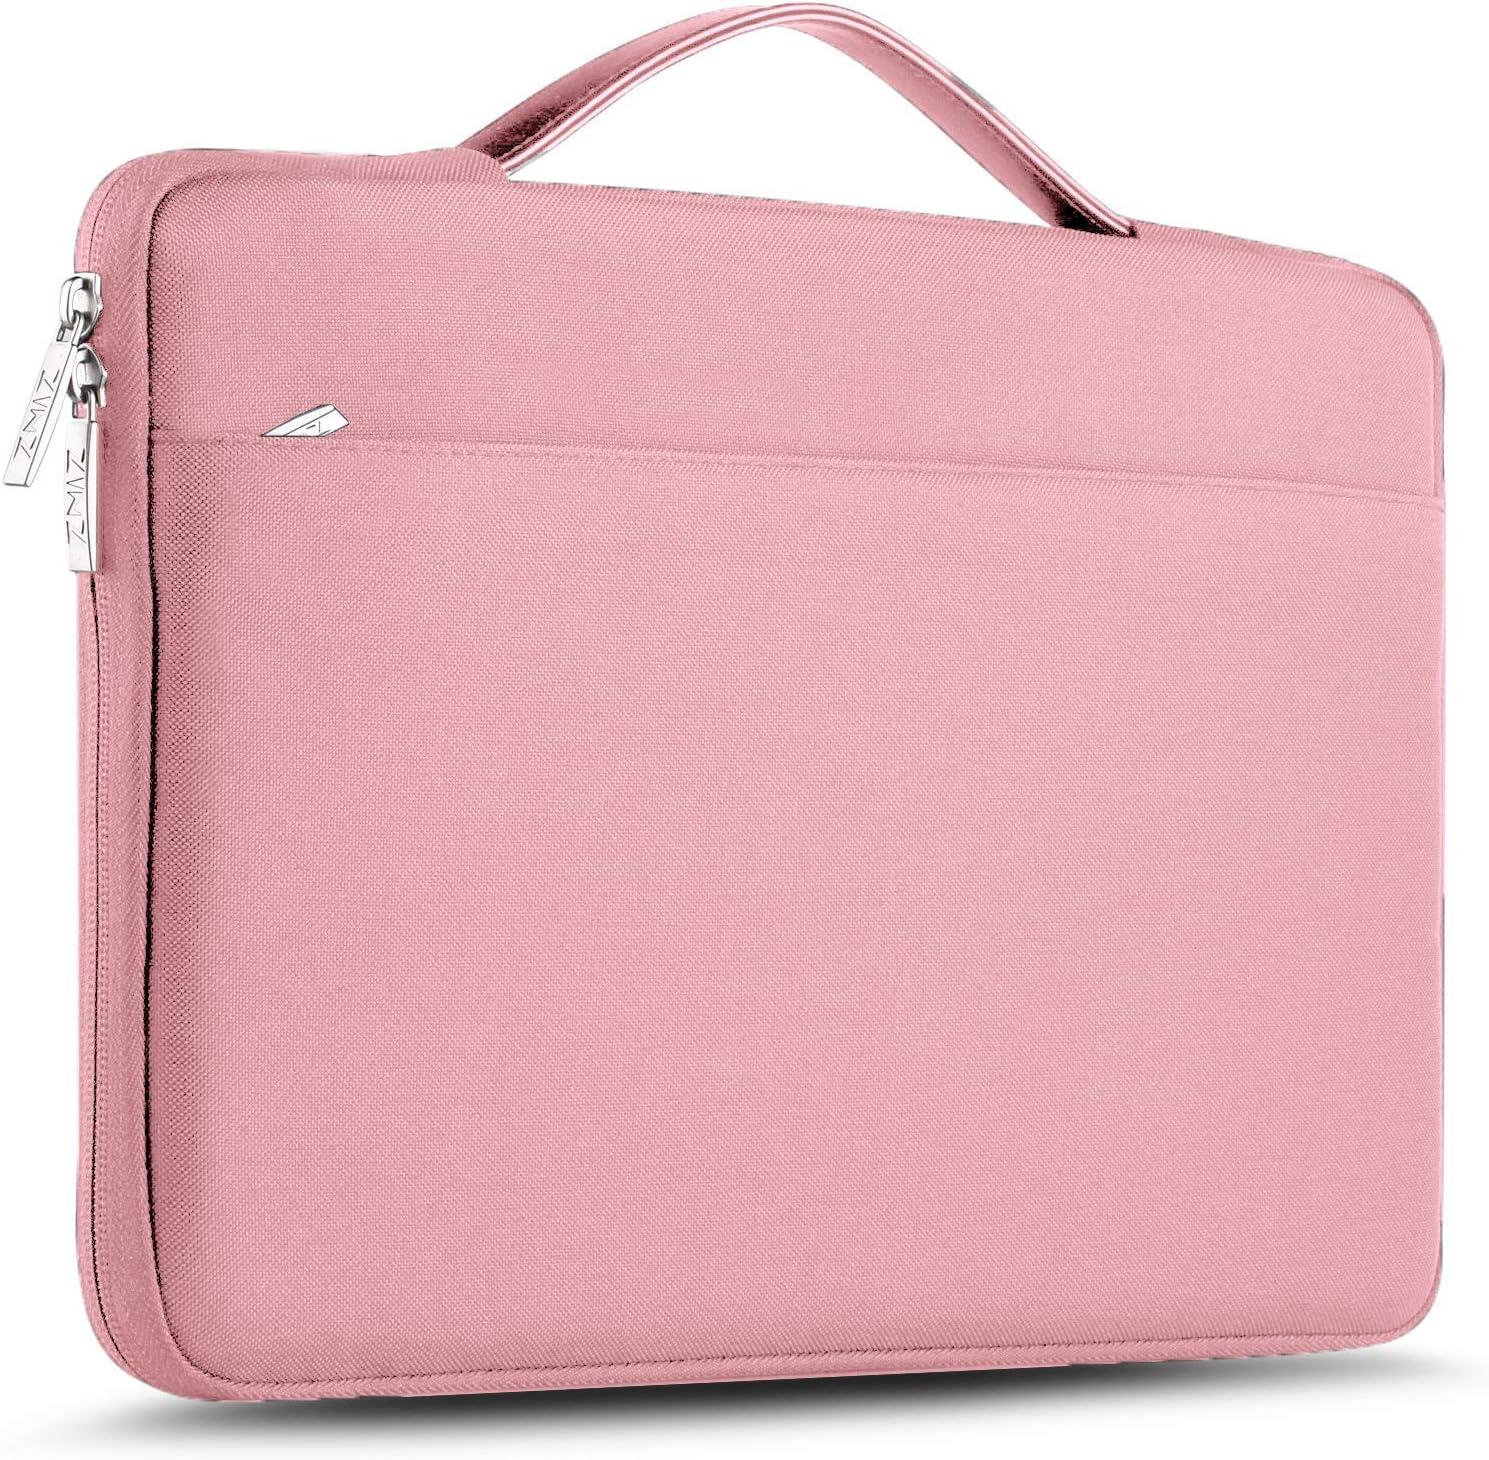 "ZINZ Laptop Sleeve 15 15.6 16 Inch Case Briefcase, Compatible MacBook Pro 16 15.4 inch, Surface Book 2/1 15"" Super Slim Spill-Resistant Handbag for Most Popular 15""-16"" Notebooks, Pink"